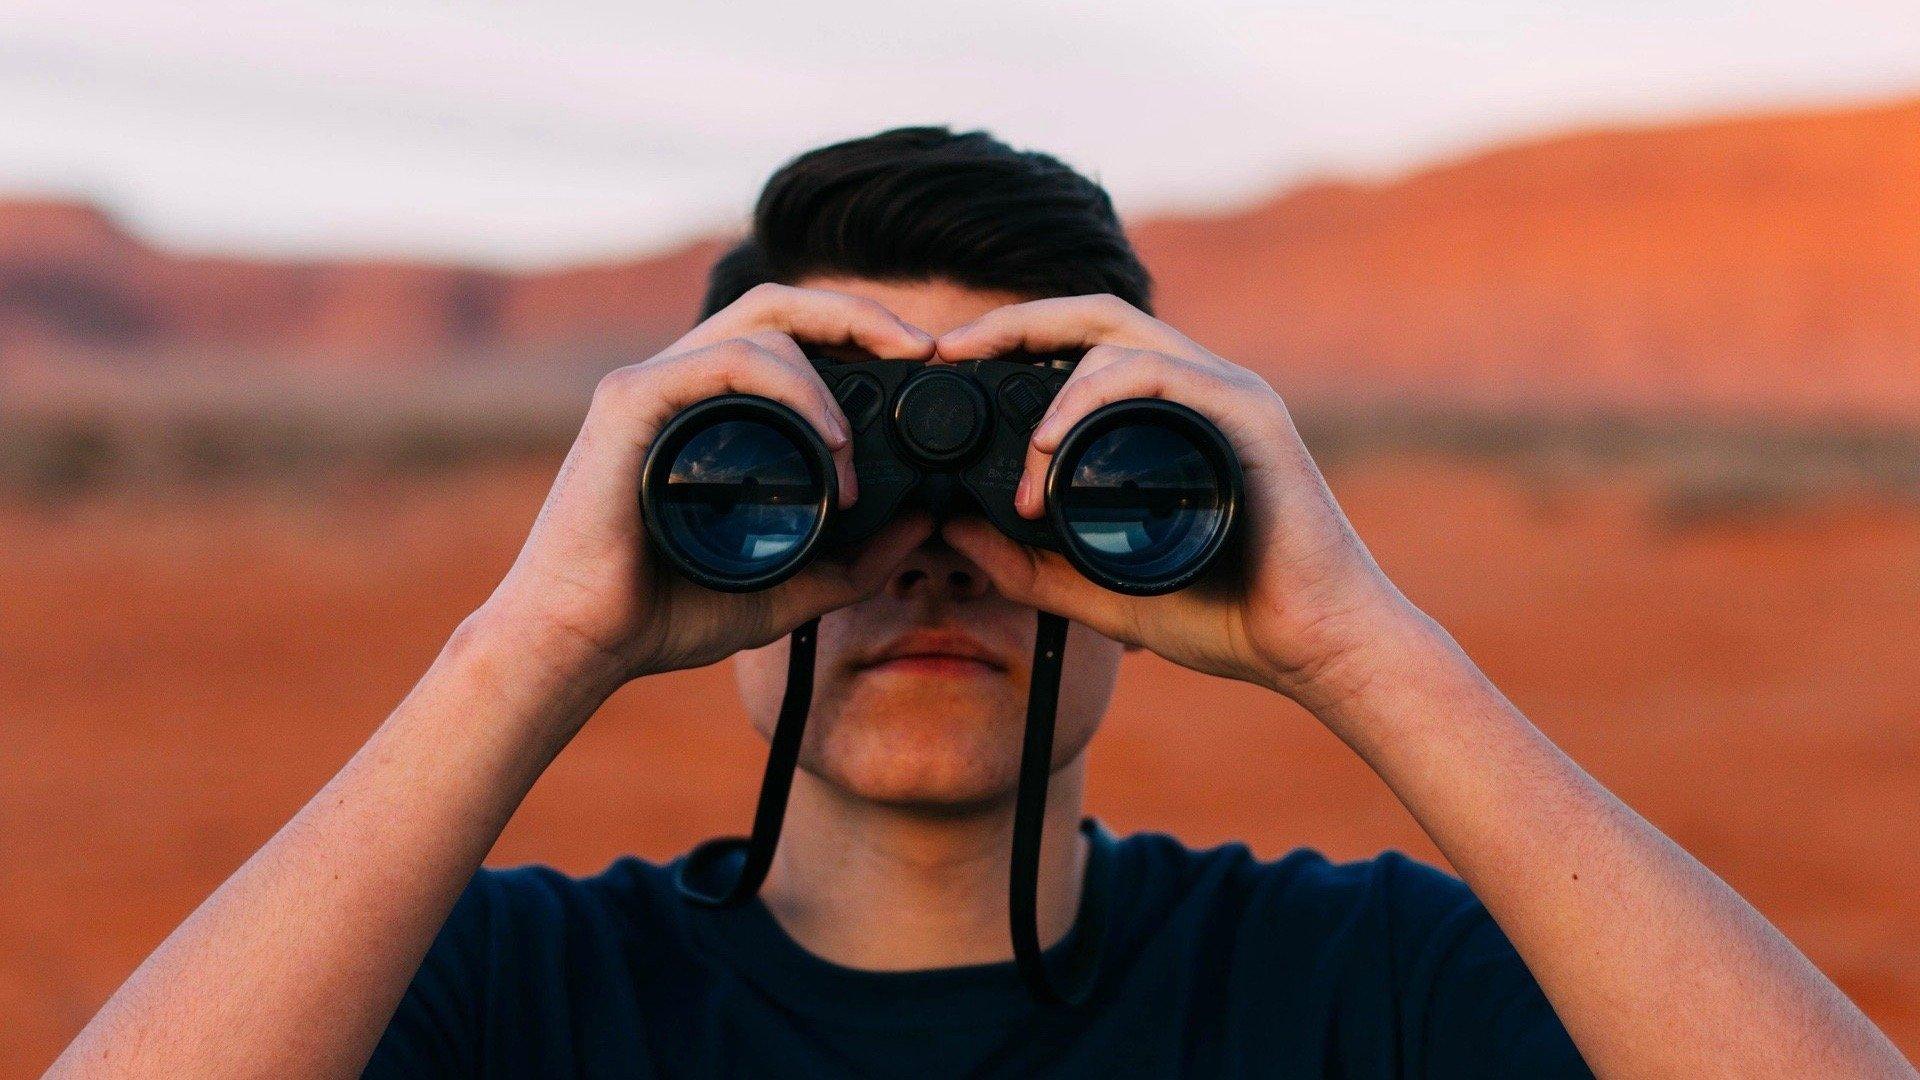 binoculars-1209011_1920 2